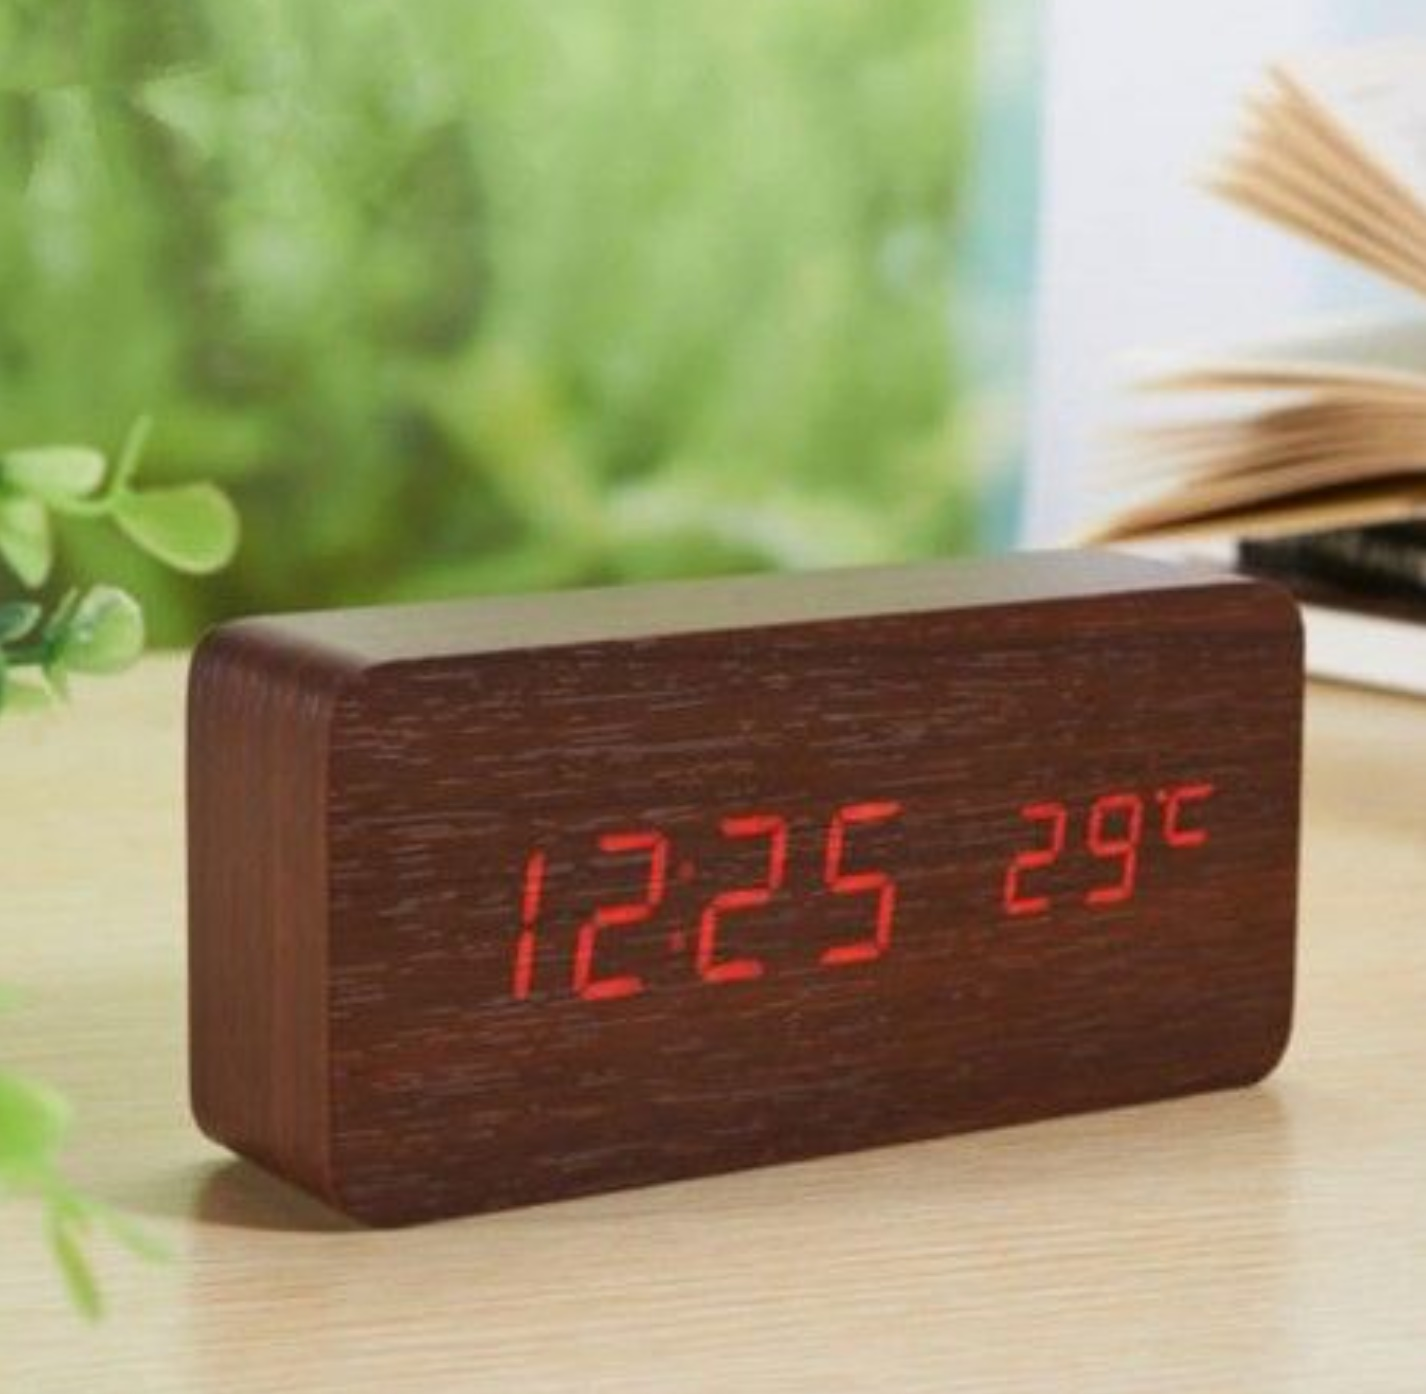 Ceas digital din lemn 862-VST cu LED si alarma